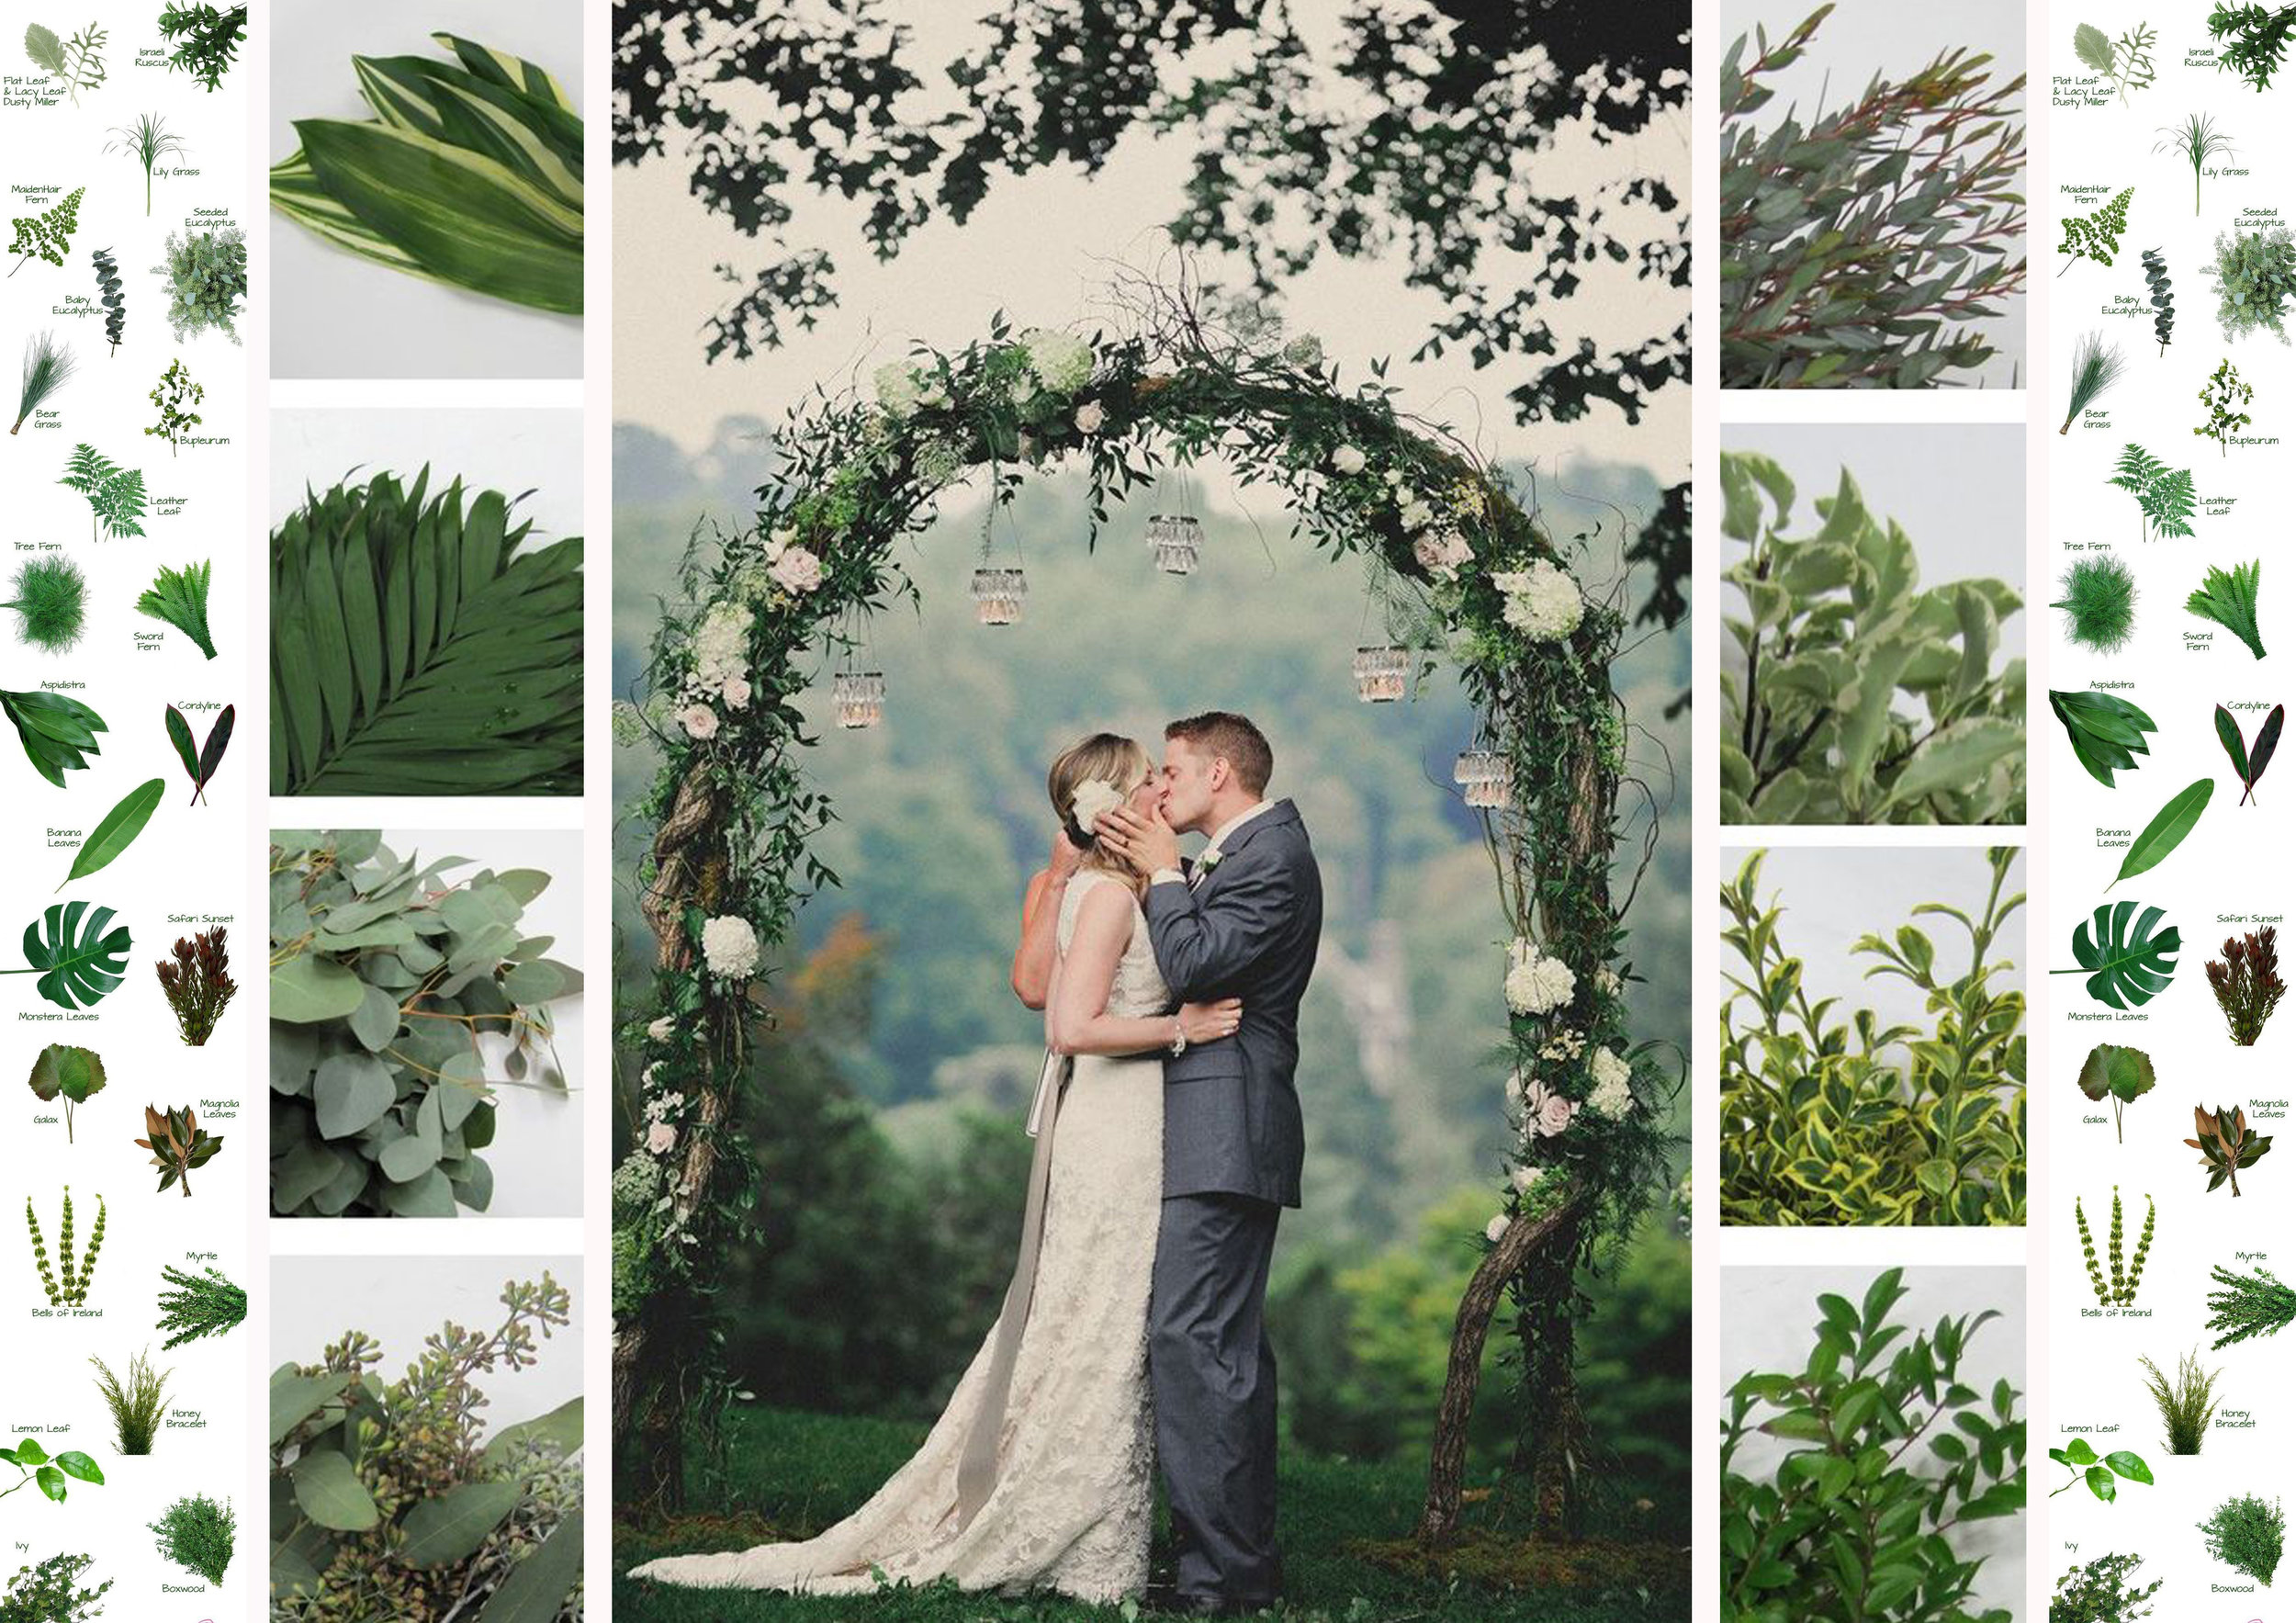 wedding greenery tendenze matrimonio 2017.jpg